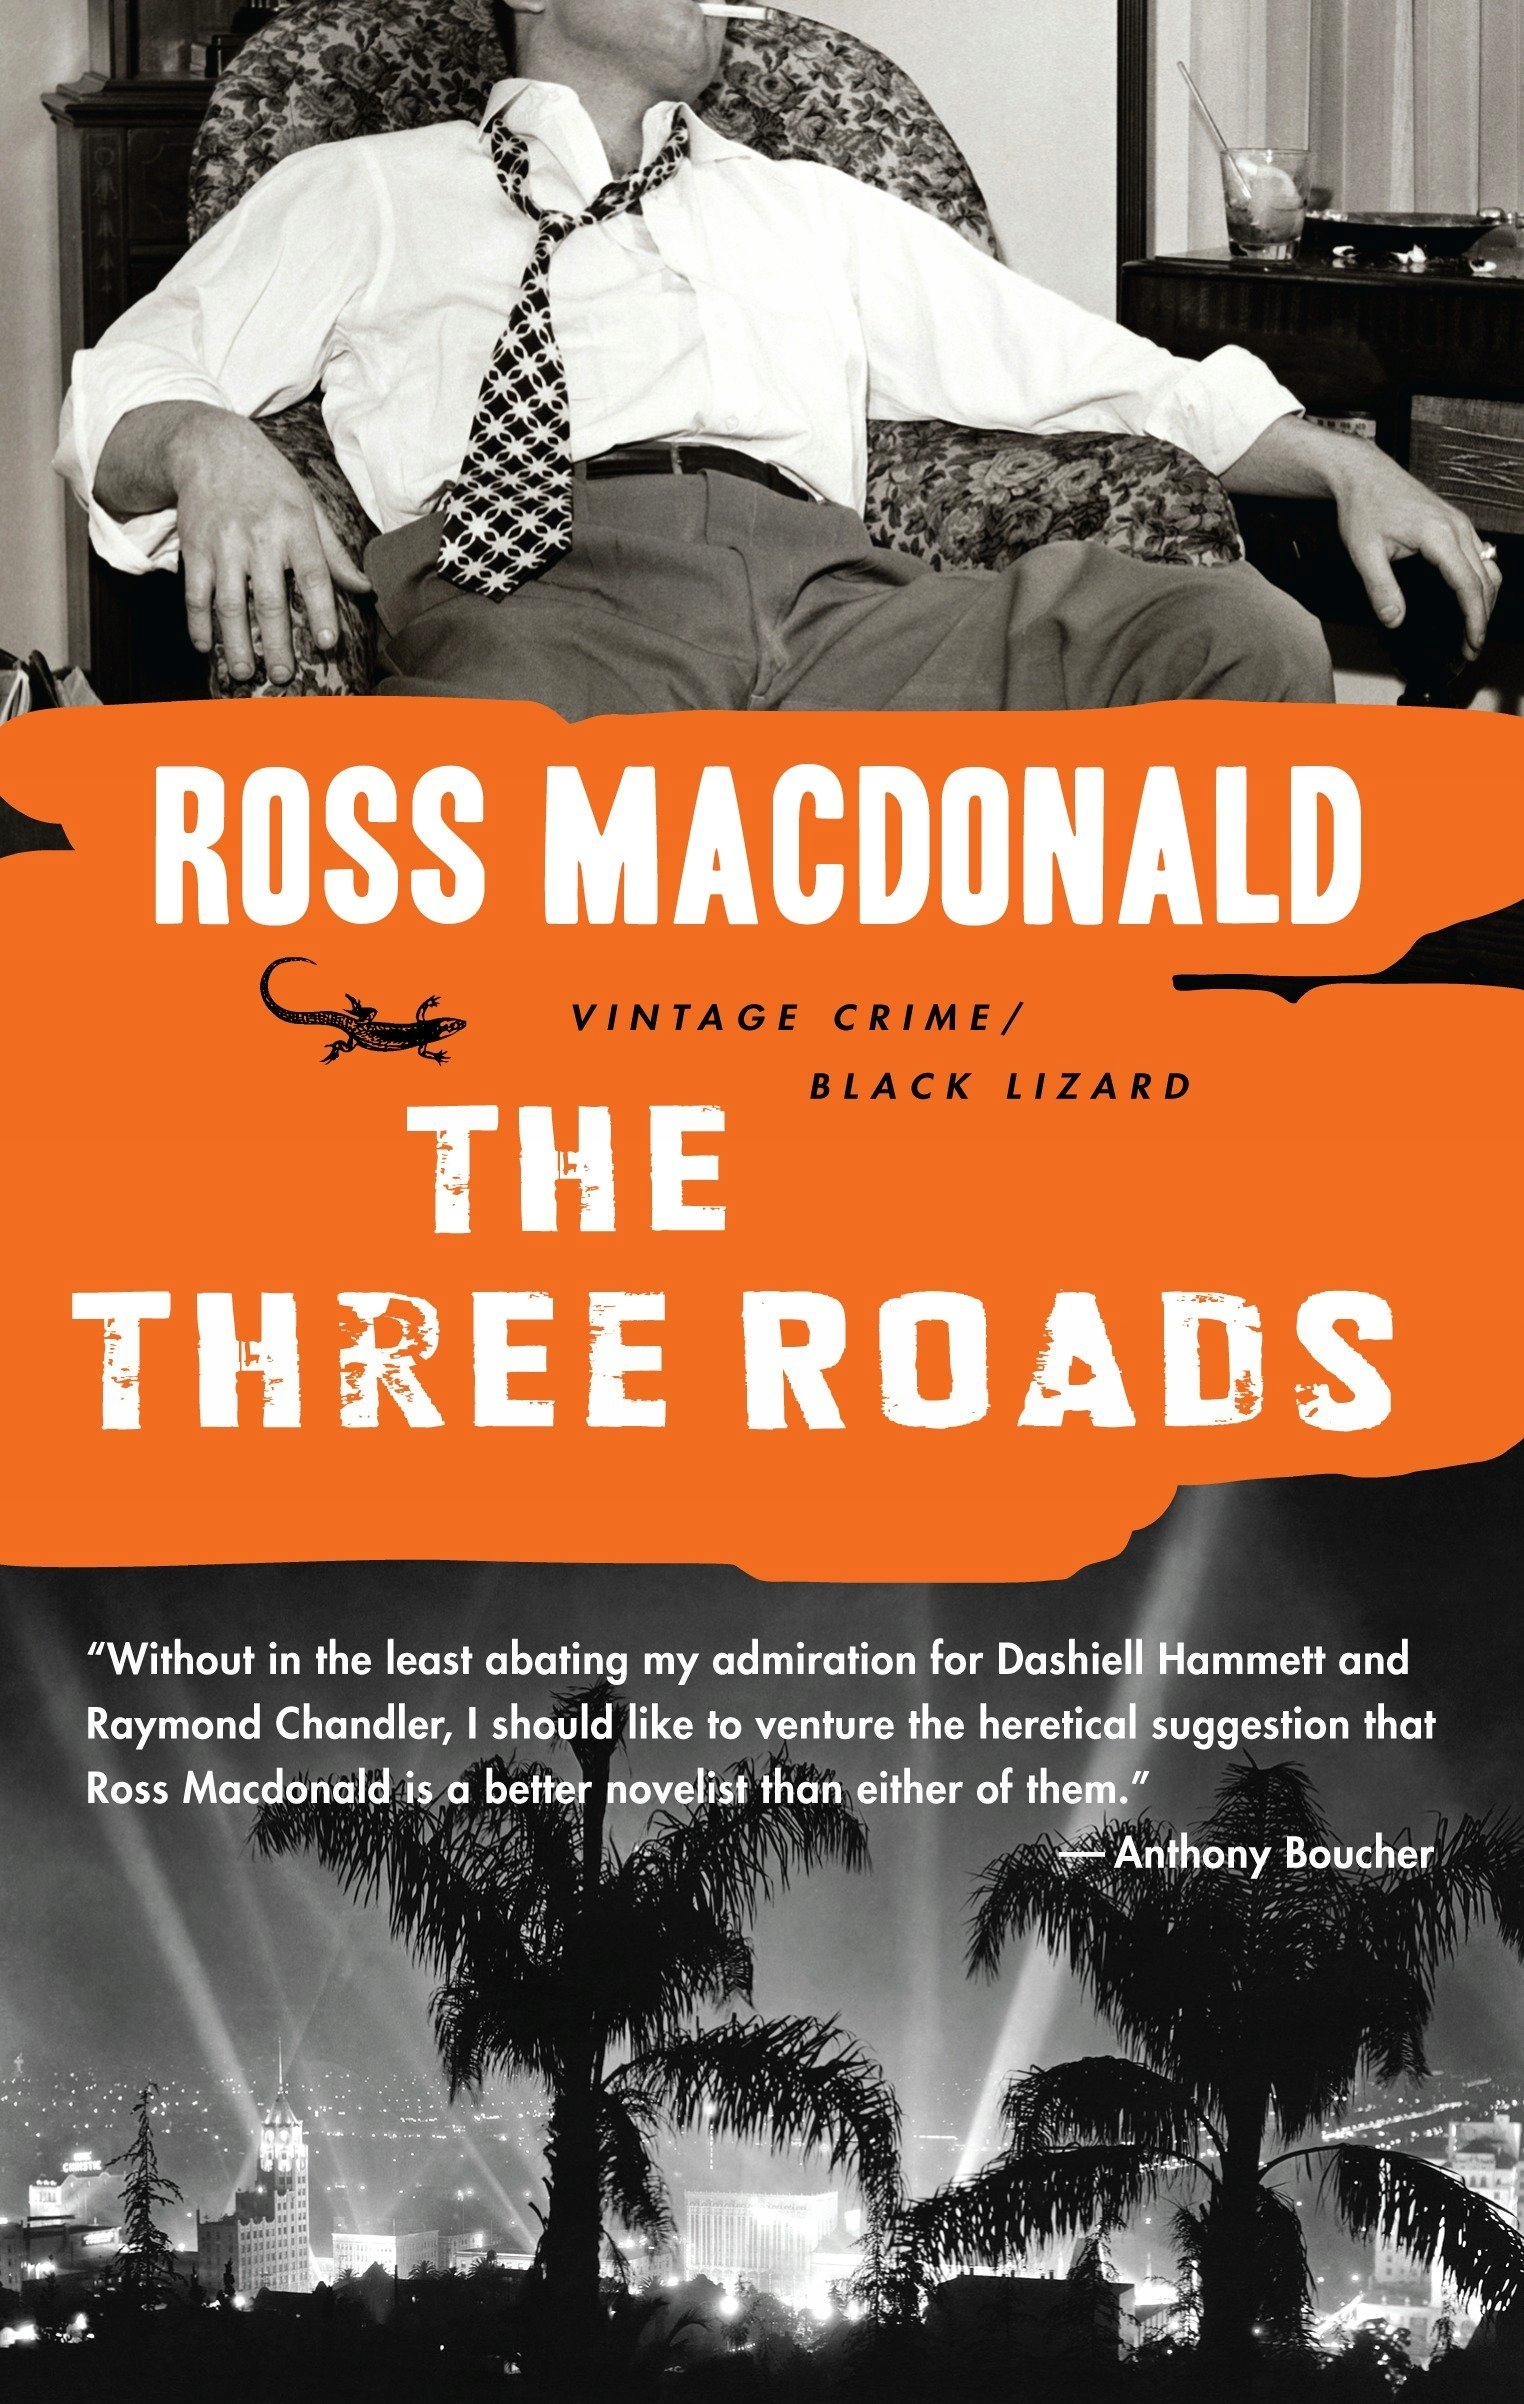 Ross MacDonald Troch Ciest (Vinobranie Trestnej Činnosti Bl